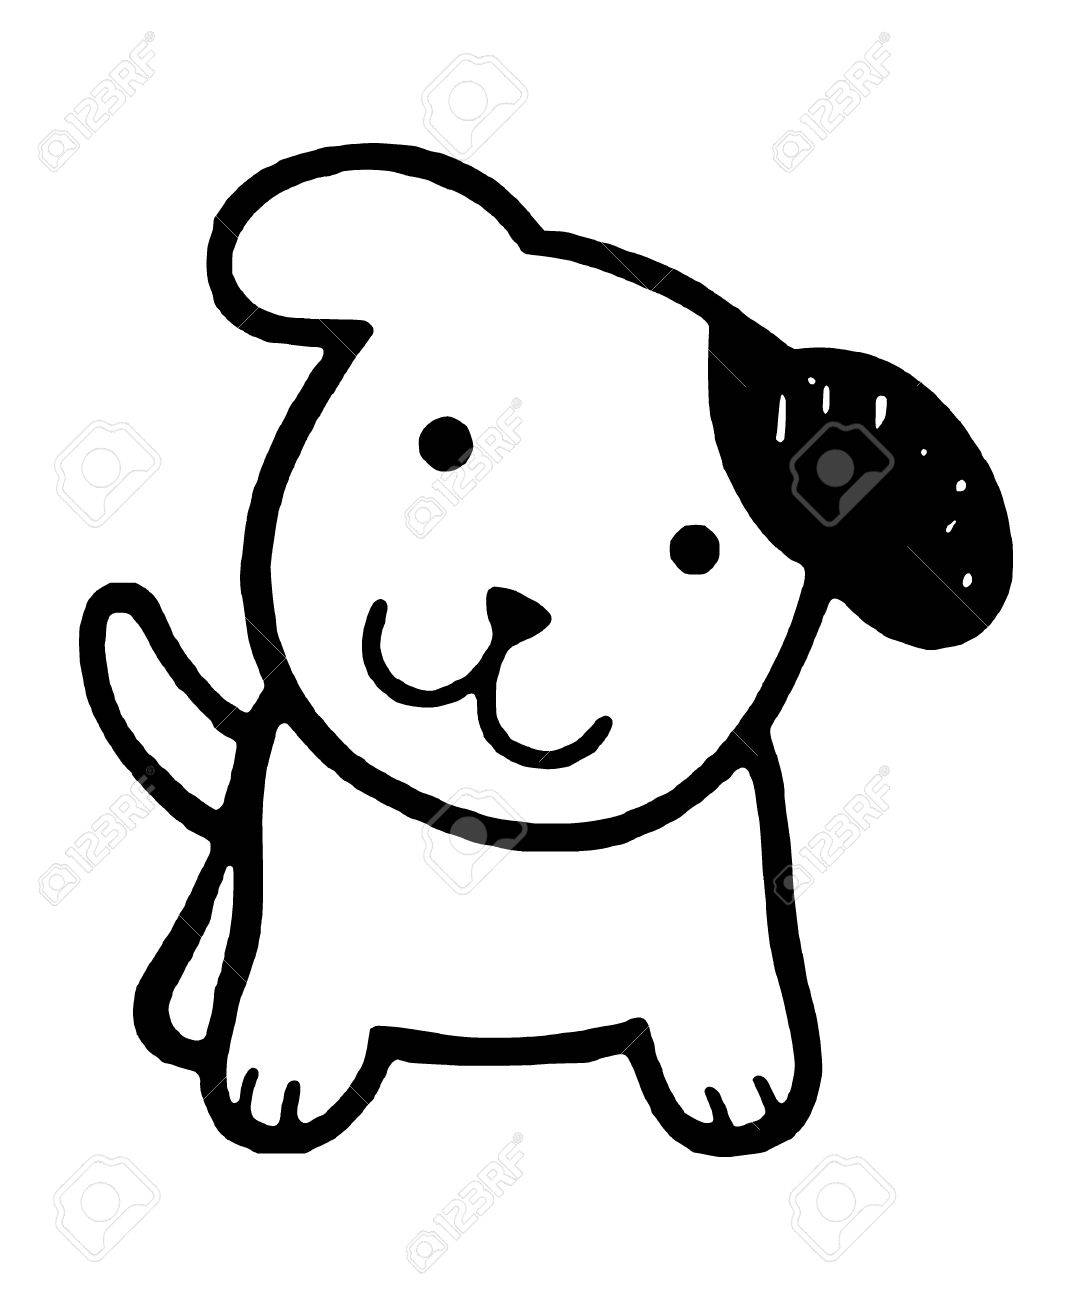 cute dog vector illustration royalty free cliparts vectors and rh 123rf com dog vector free dog vector art